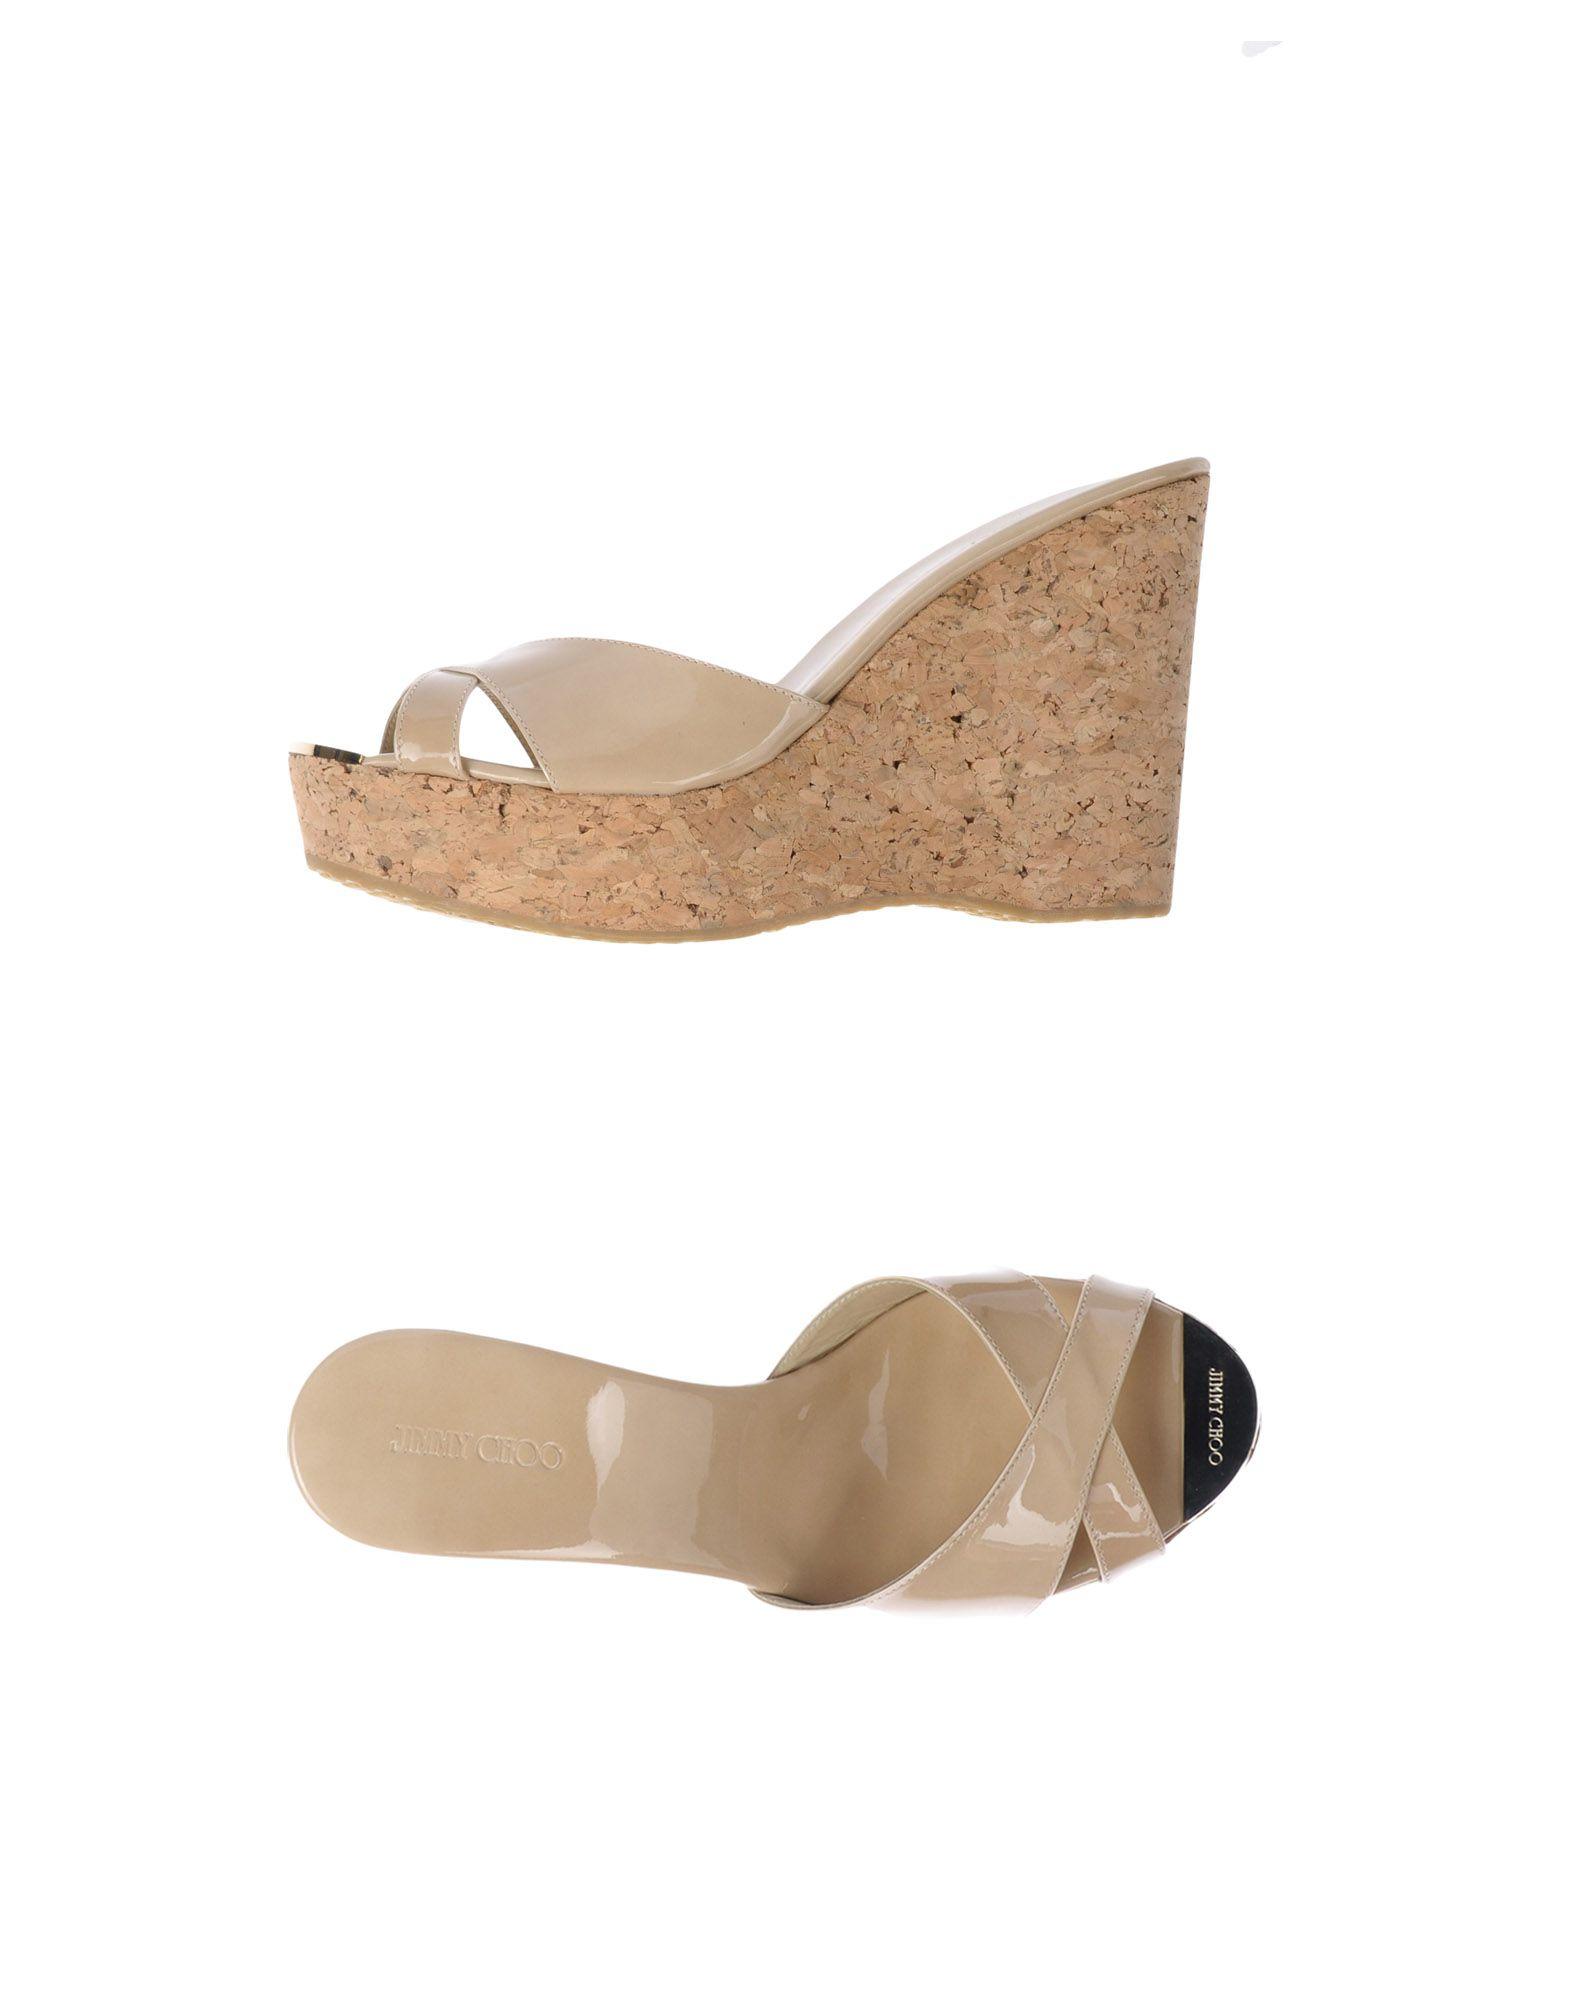 Jimmy Choo Sandalen Damen  11487745MUGut aussehende strapazierfähige Schuhe